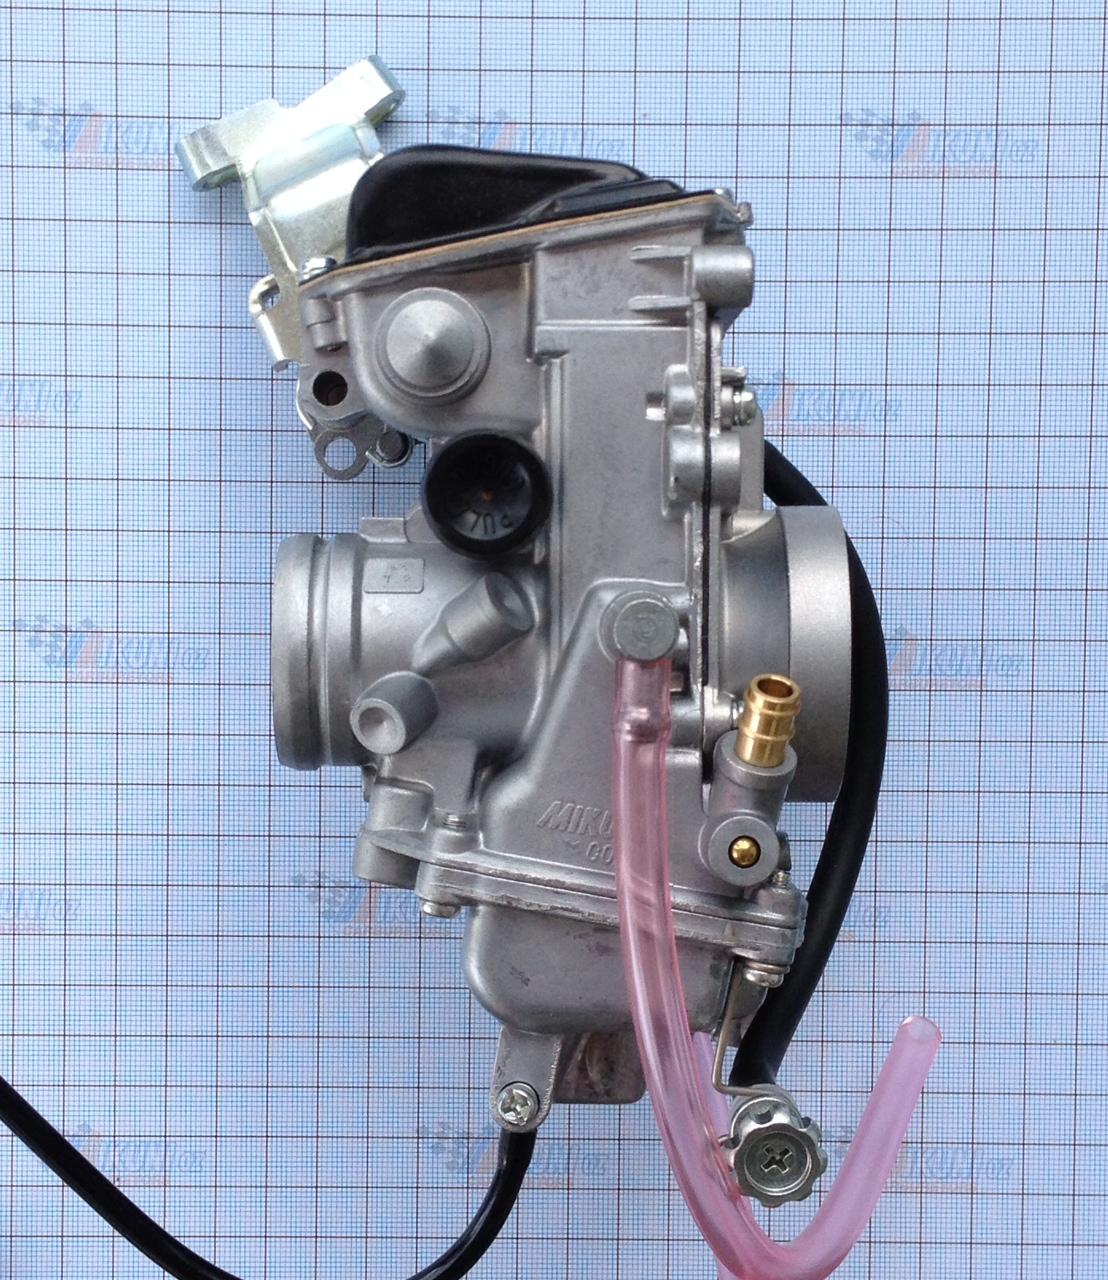 1. TM33-8012 33mm TM Mikuni Carburetor | Mikunioz